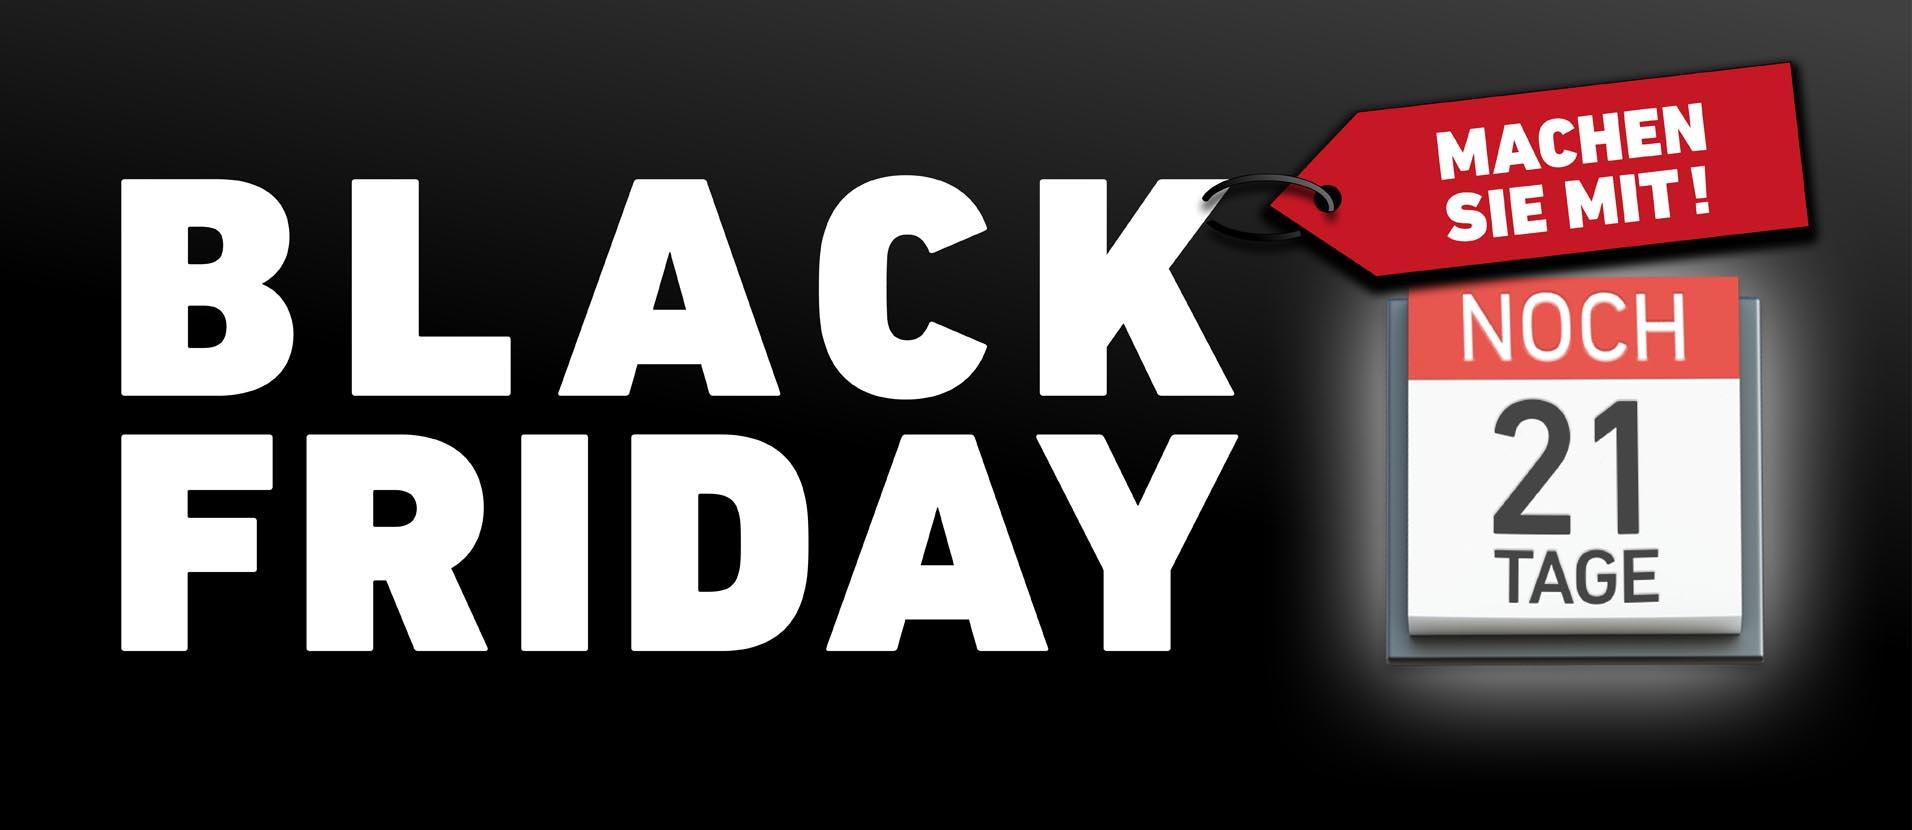 Black-Friday - Noch 21 Tage